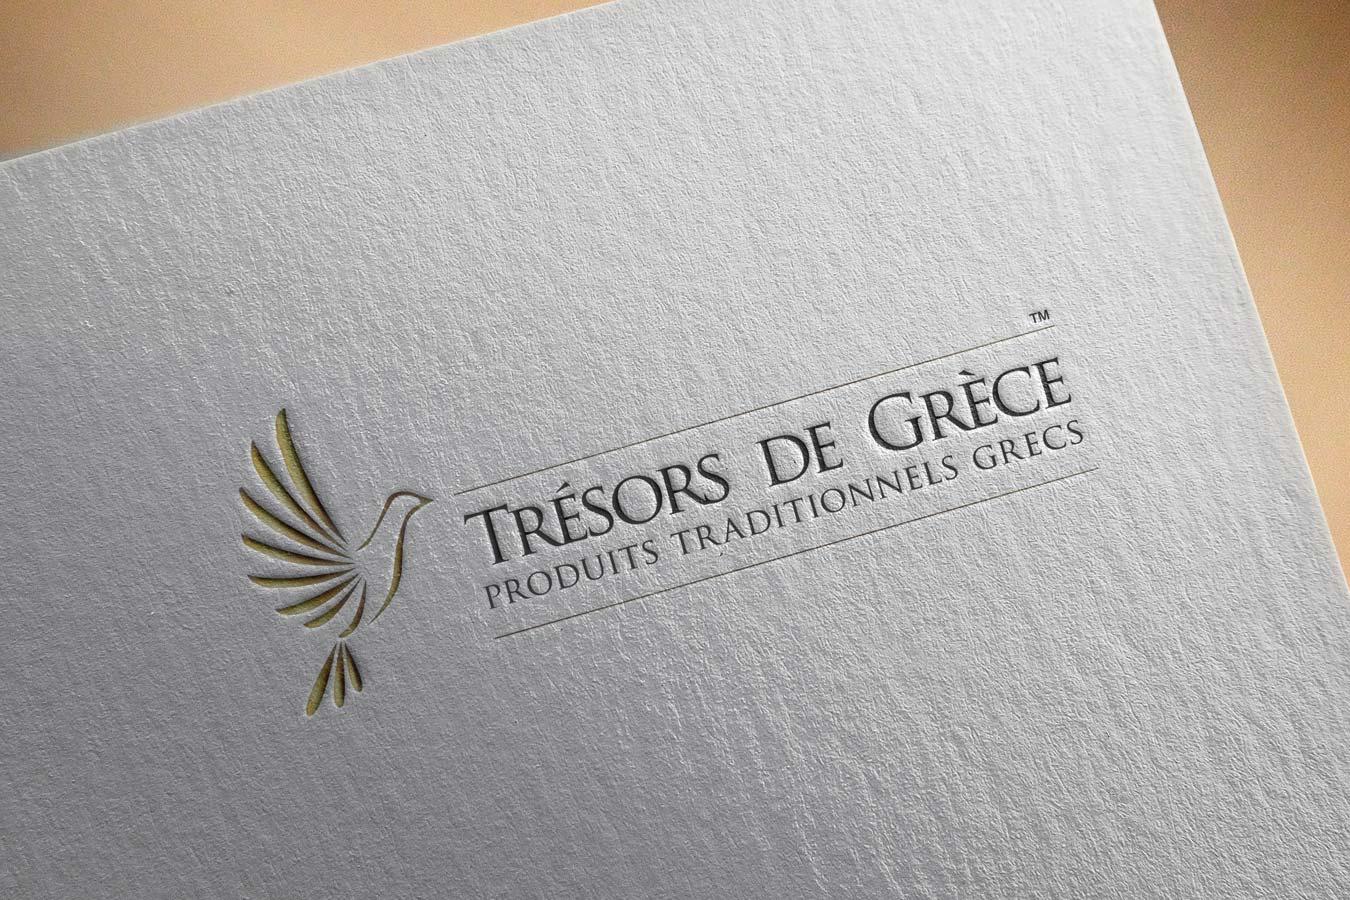 Tresors de Grece logo